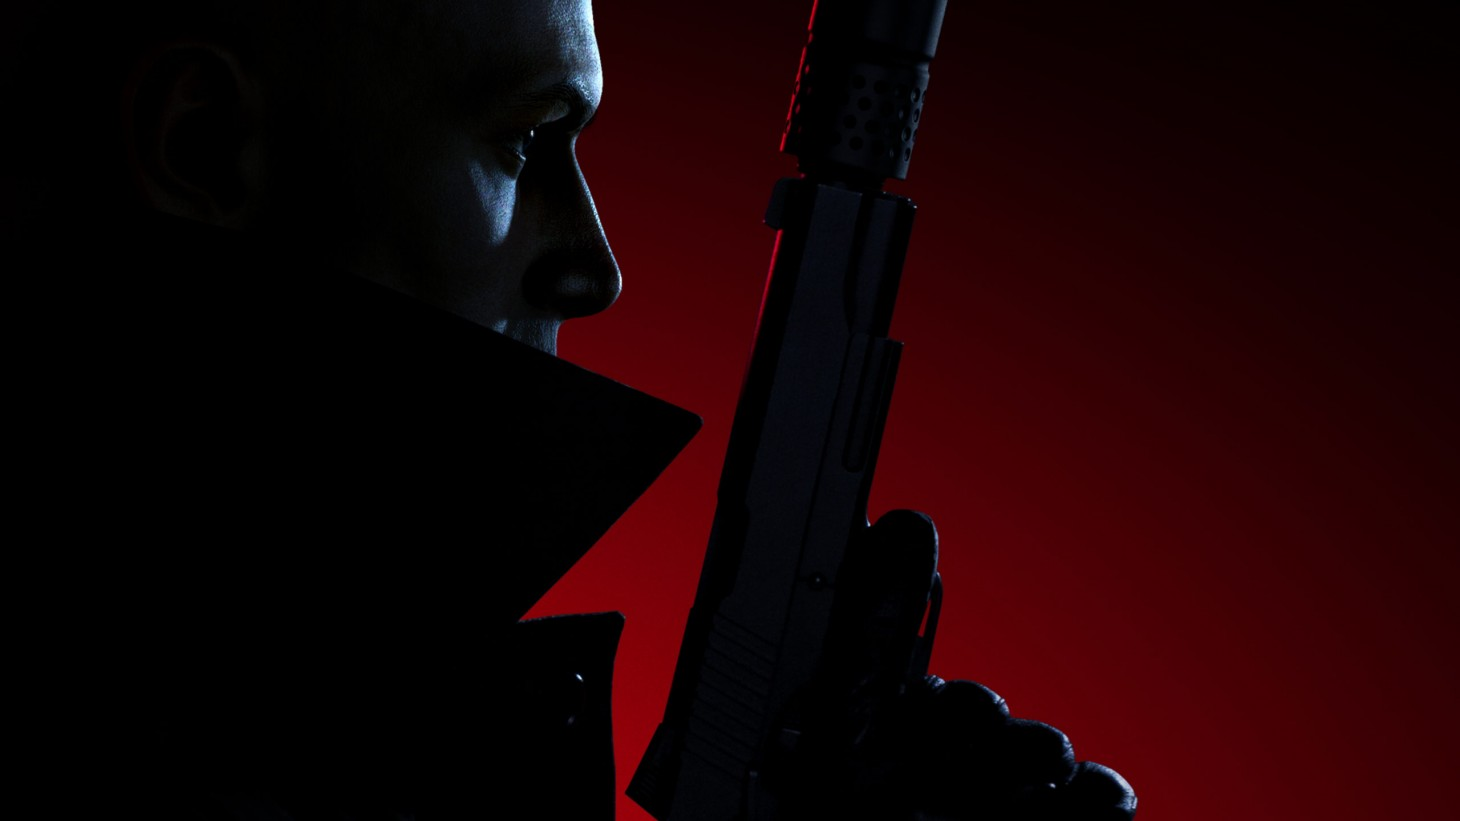 Hitman 3 Coming To Nintendo Switch Via Cloud Streaming - Game Informer